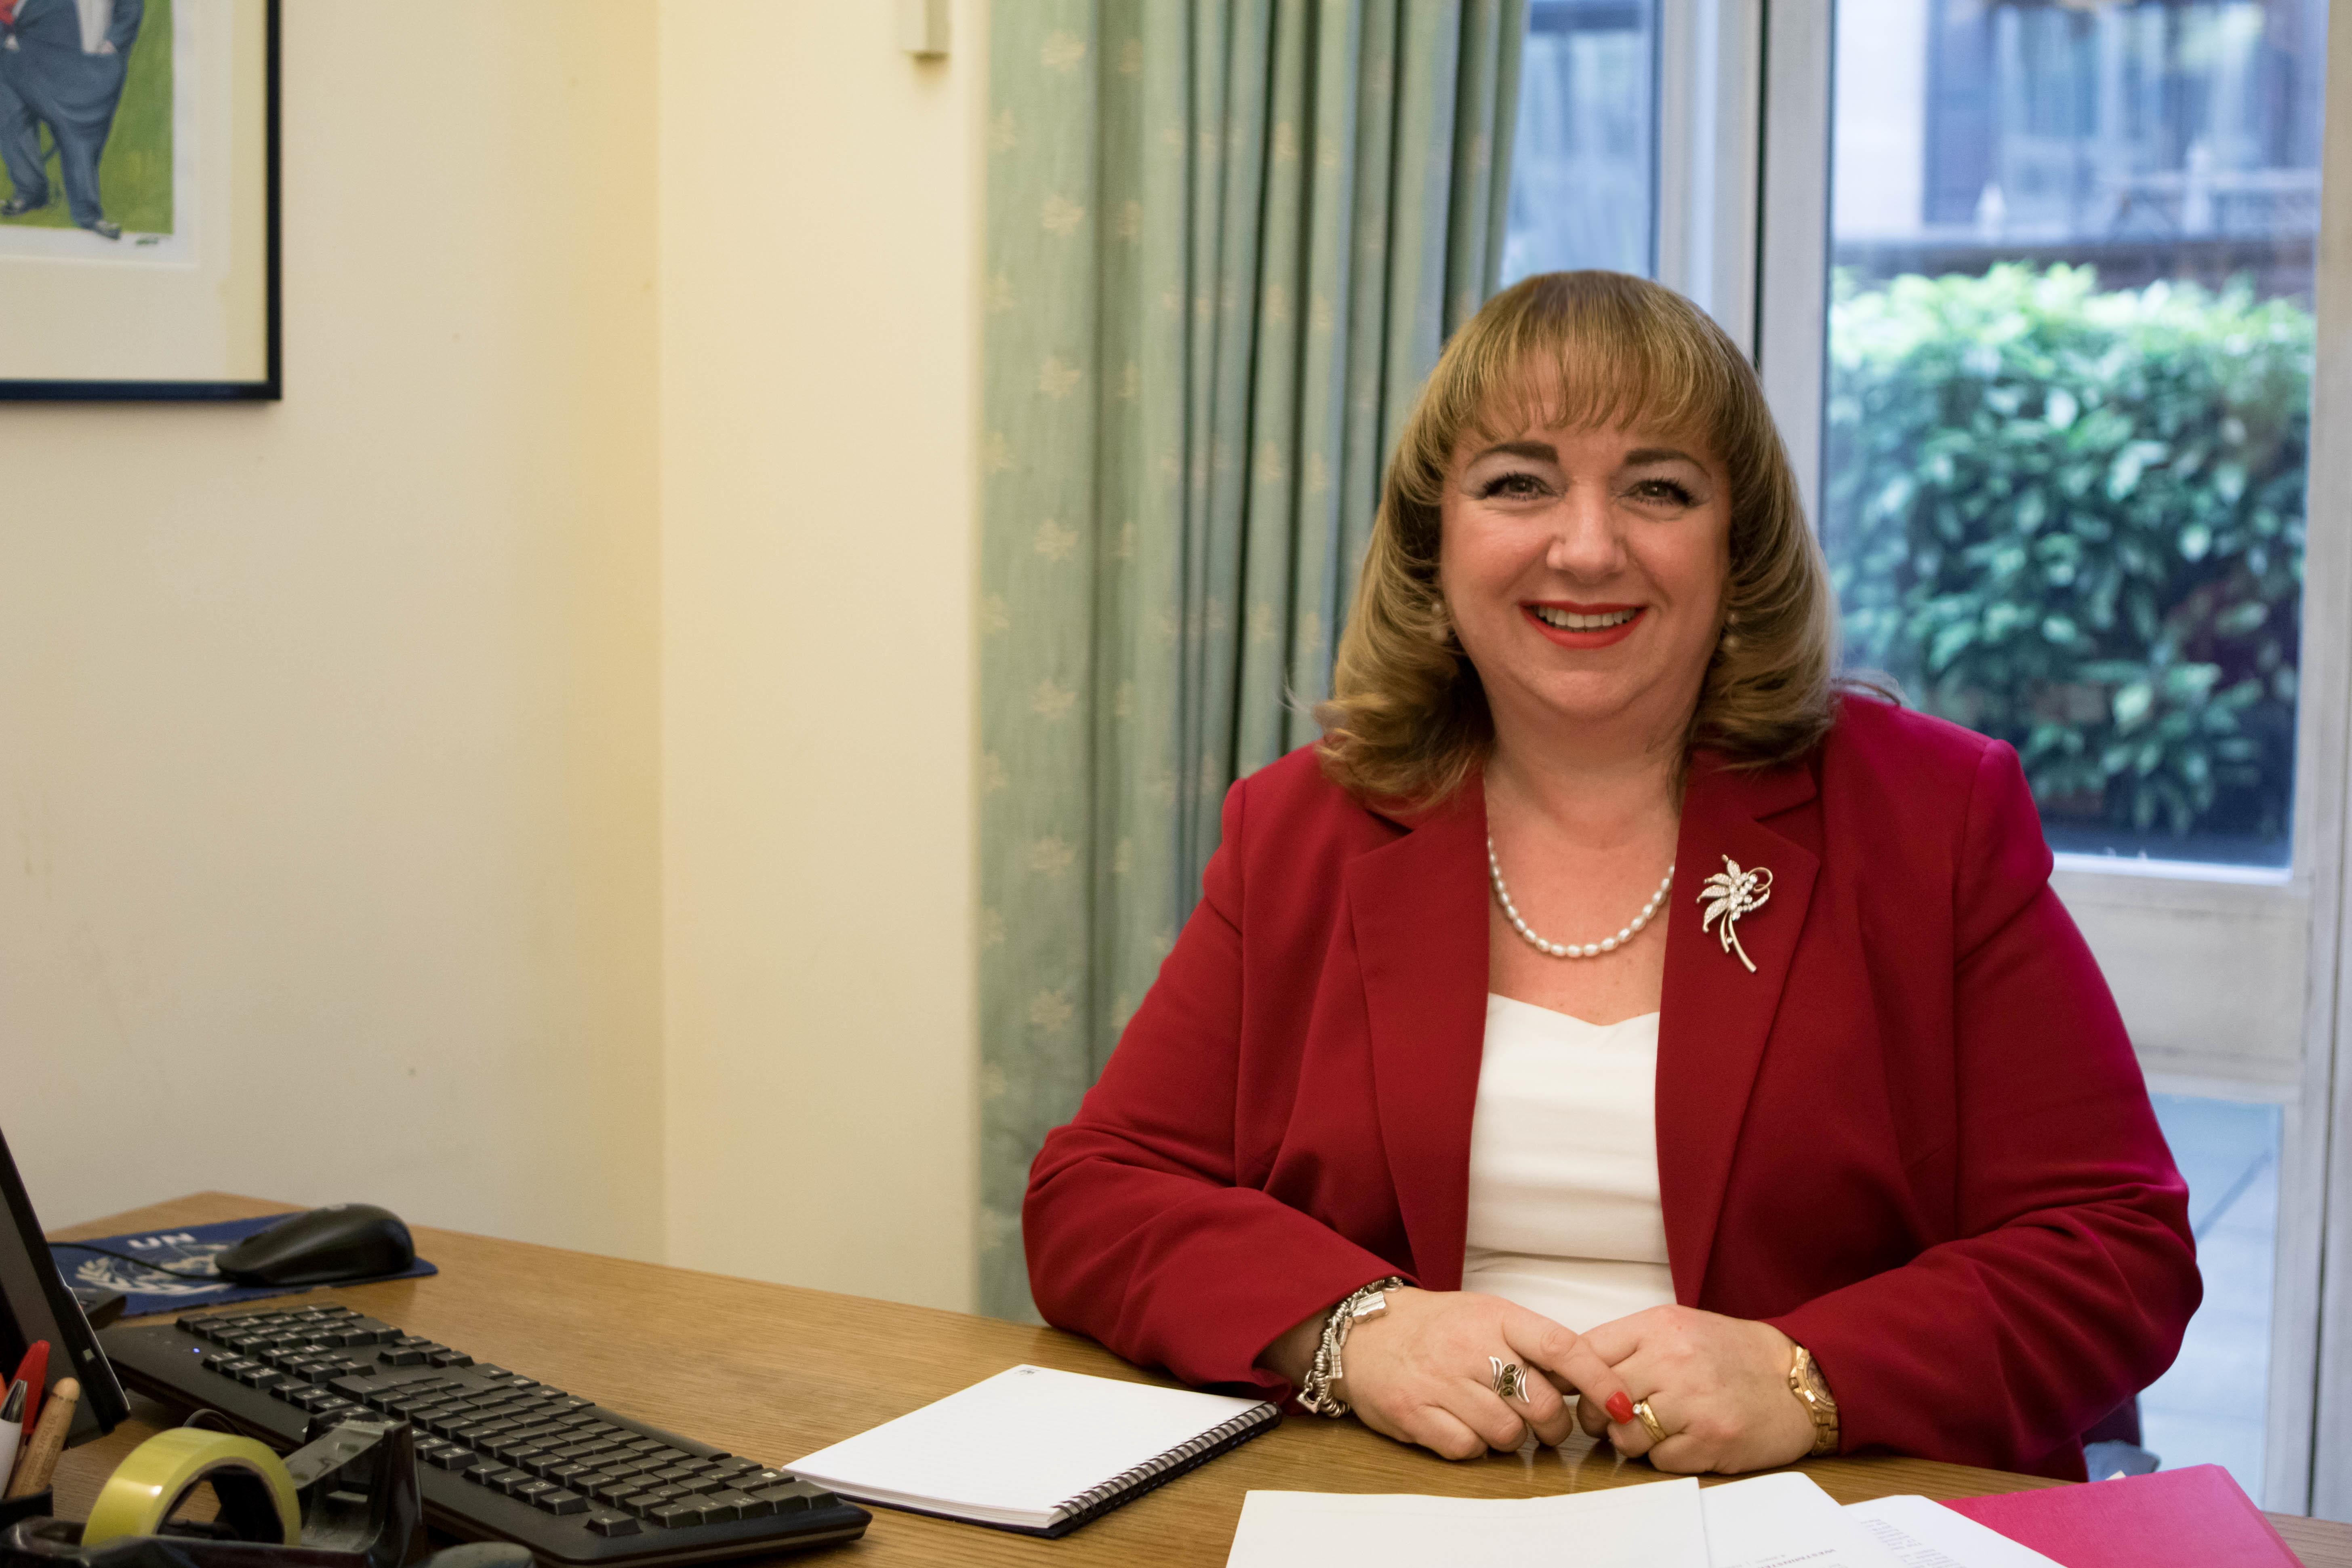 Image shows Sharon at a desk